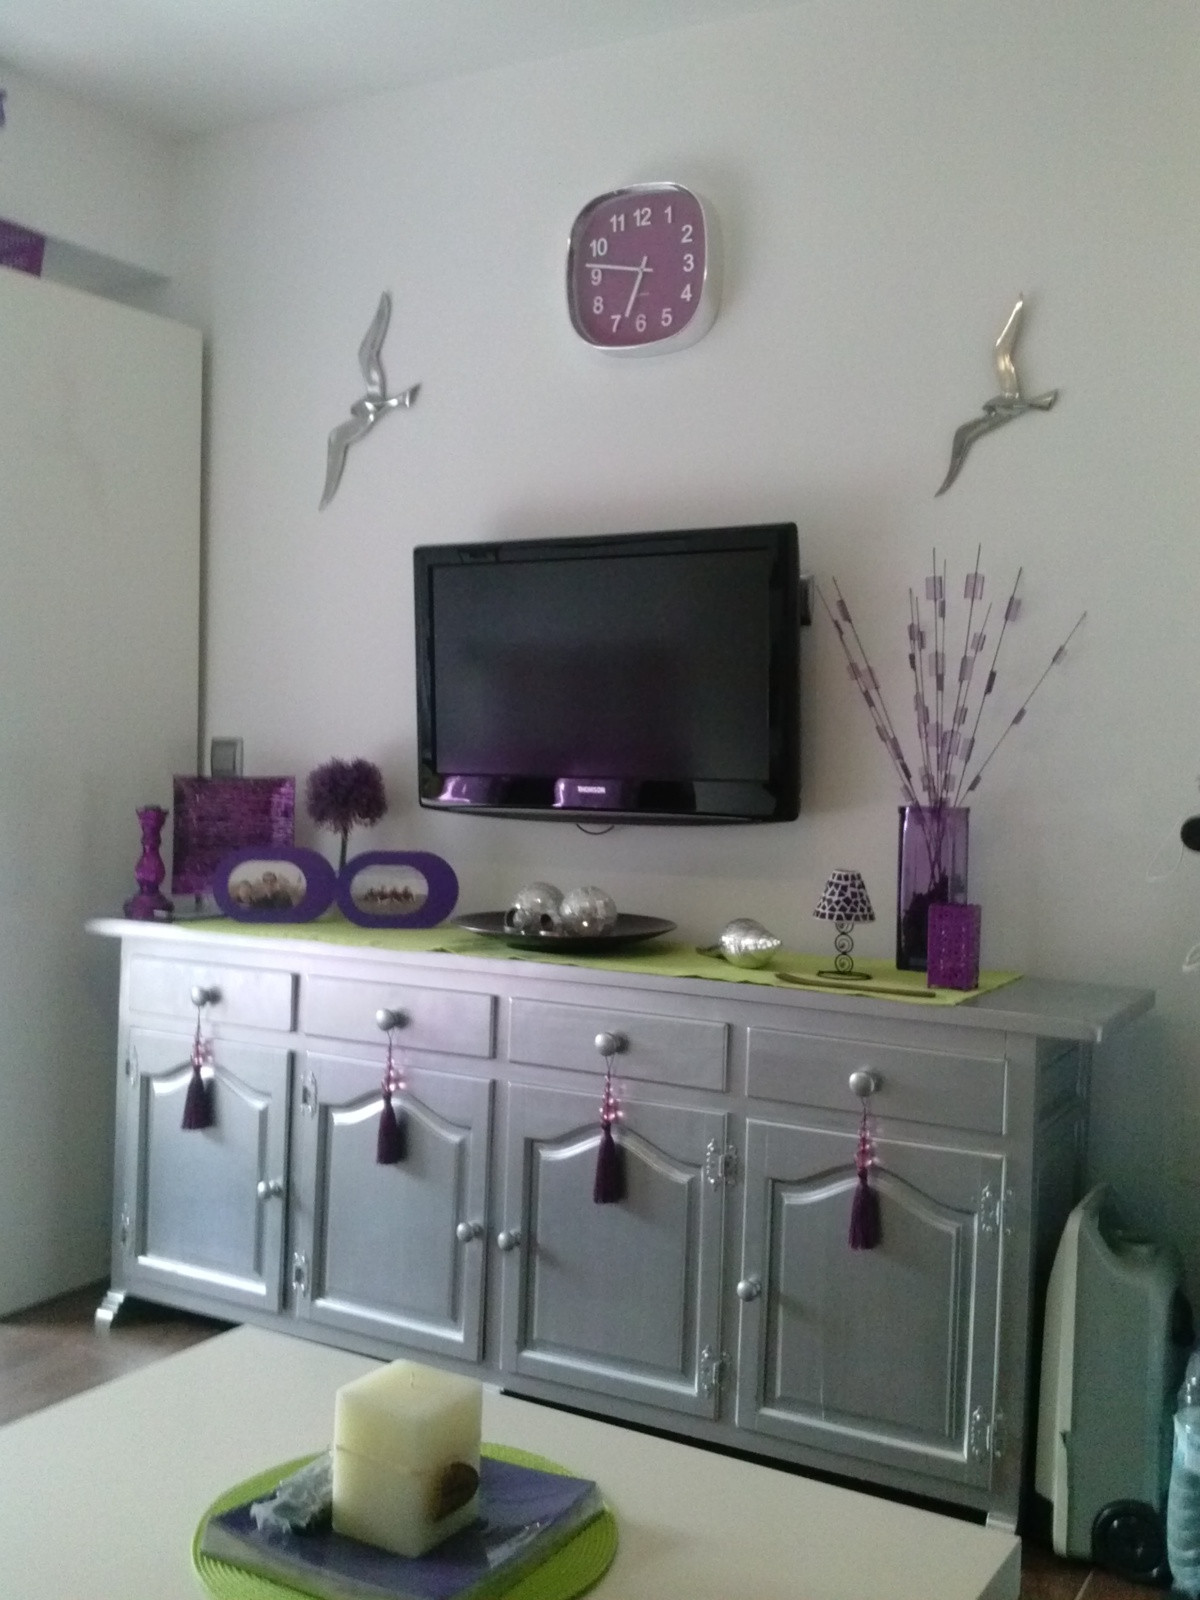 Studio for sale - Estepona